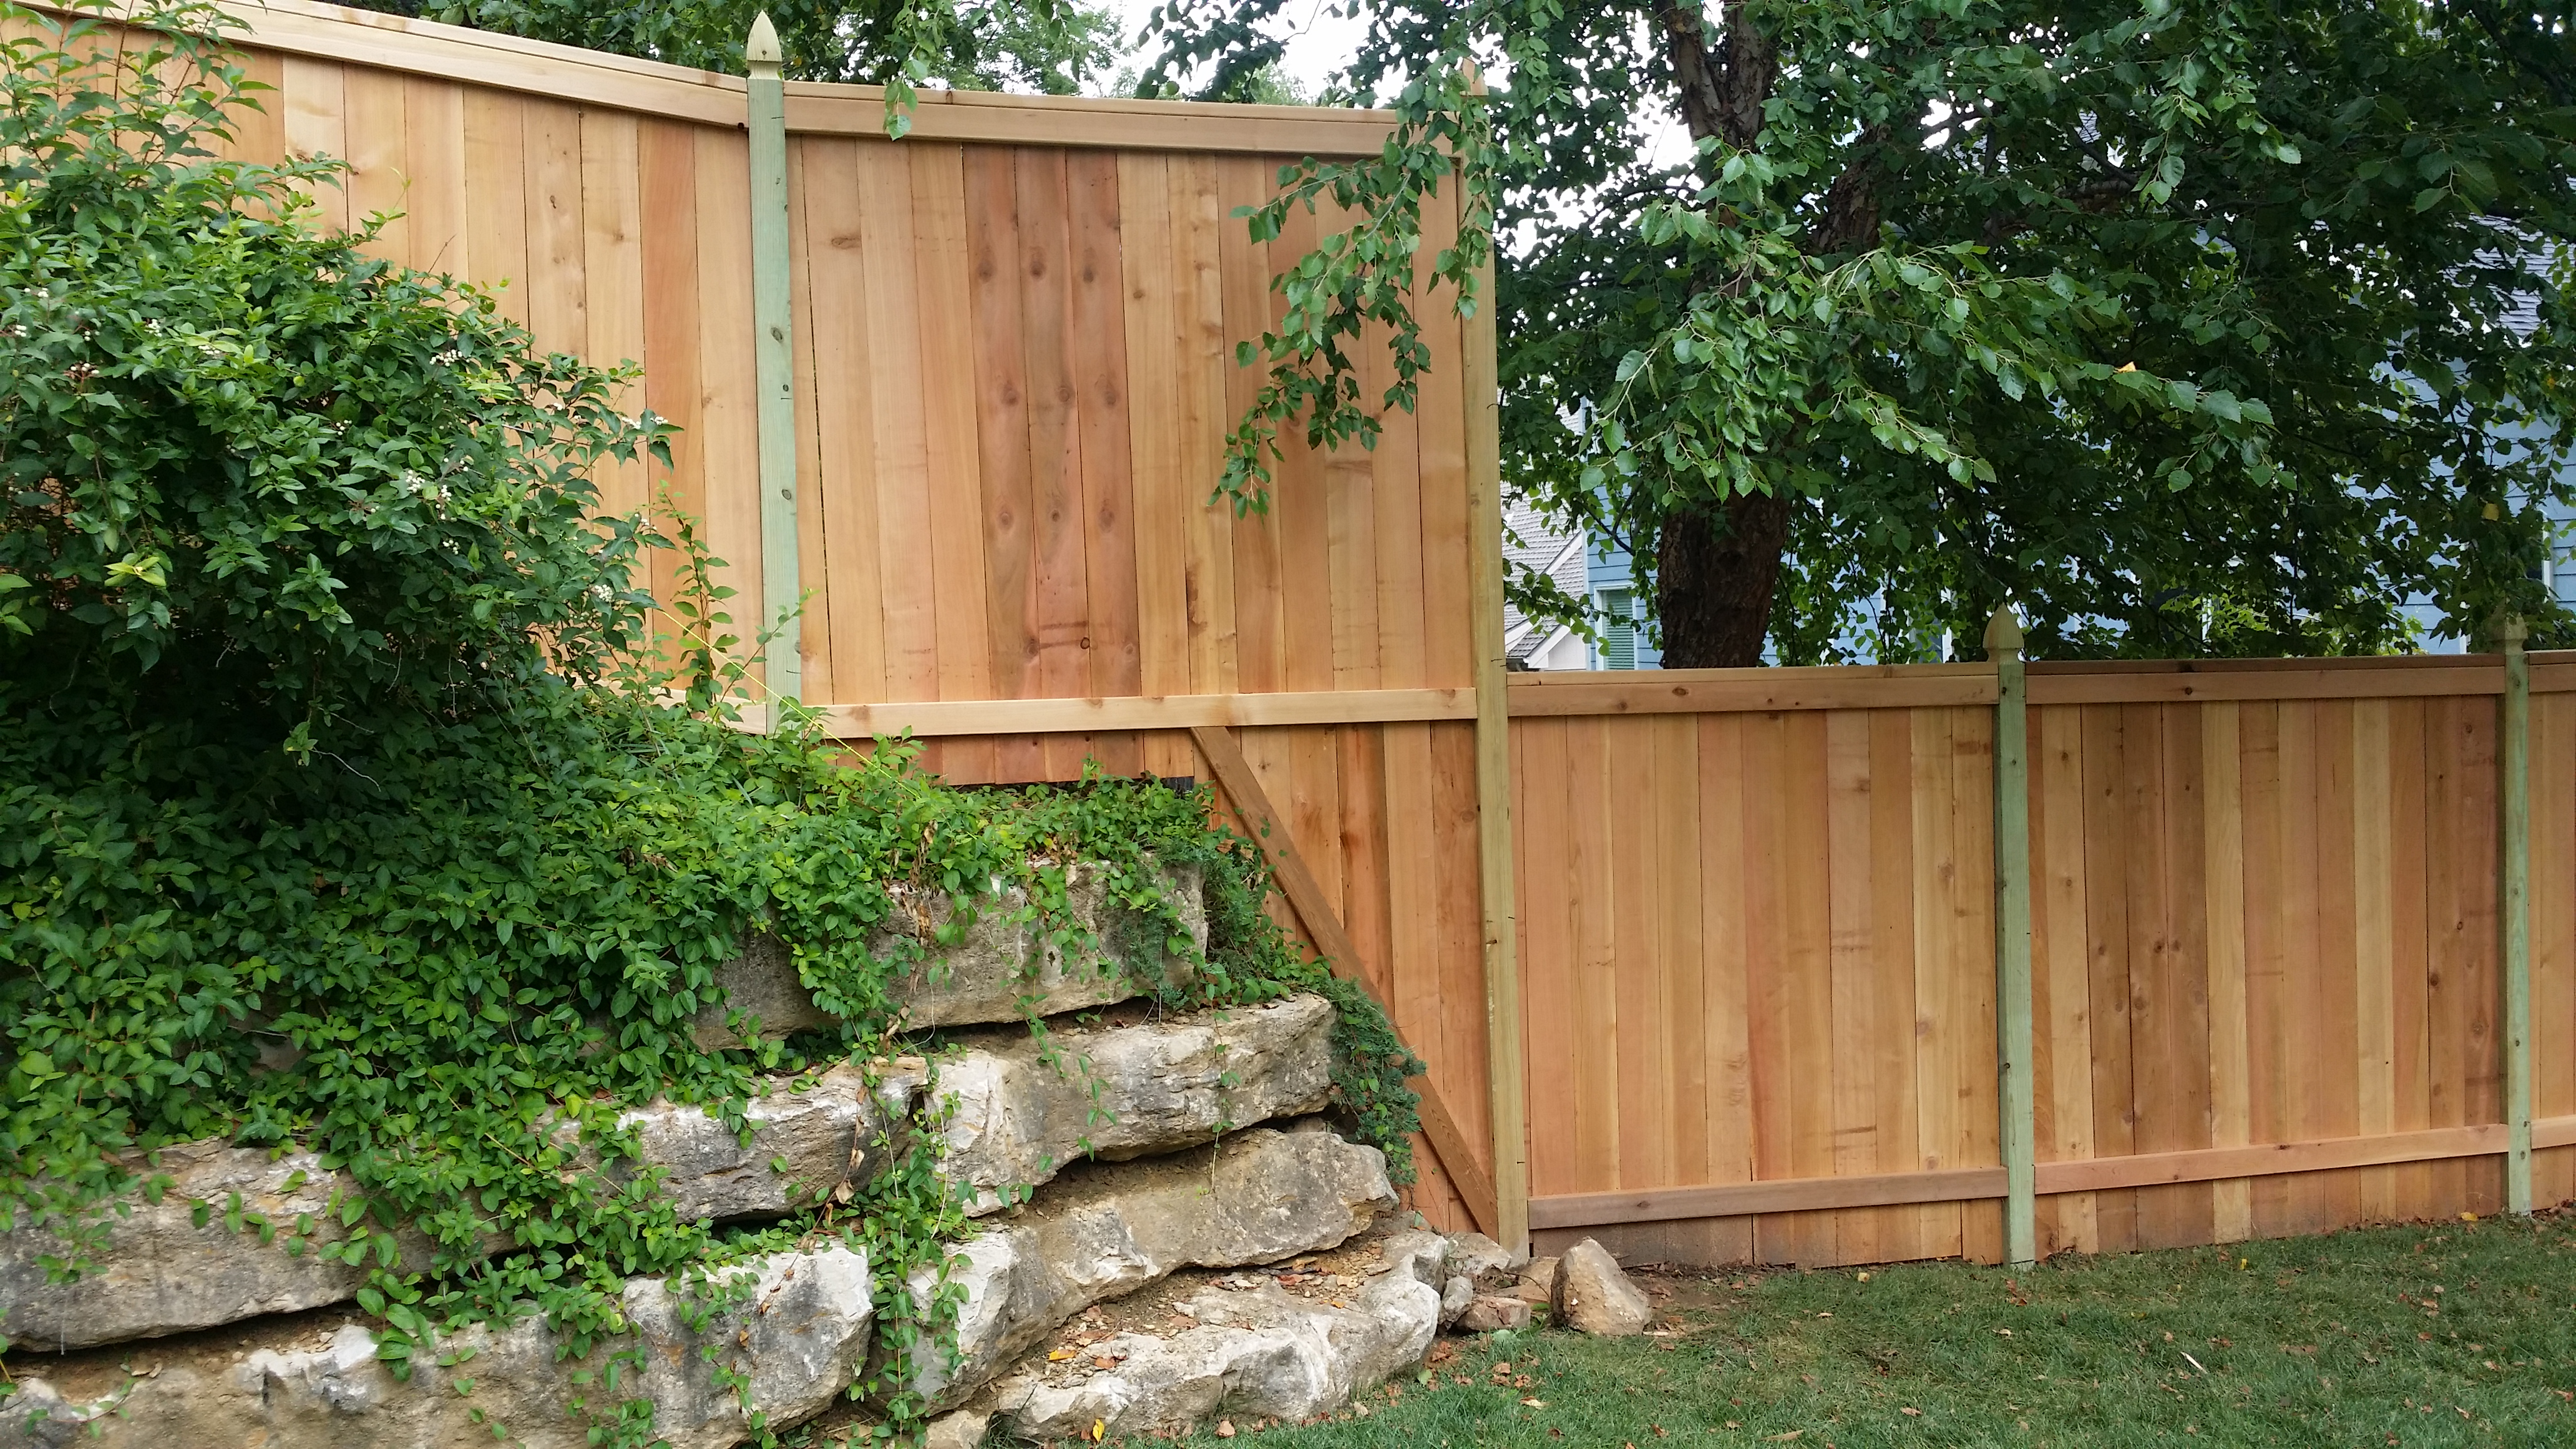 Woods Lumber Independence Ks ~ Wood fence perfect company kansas city